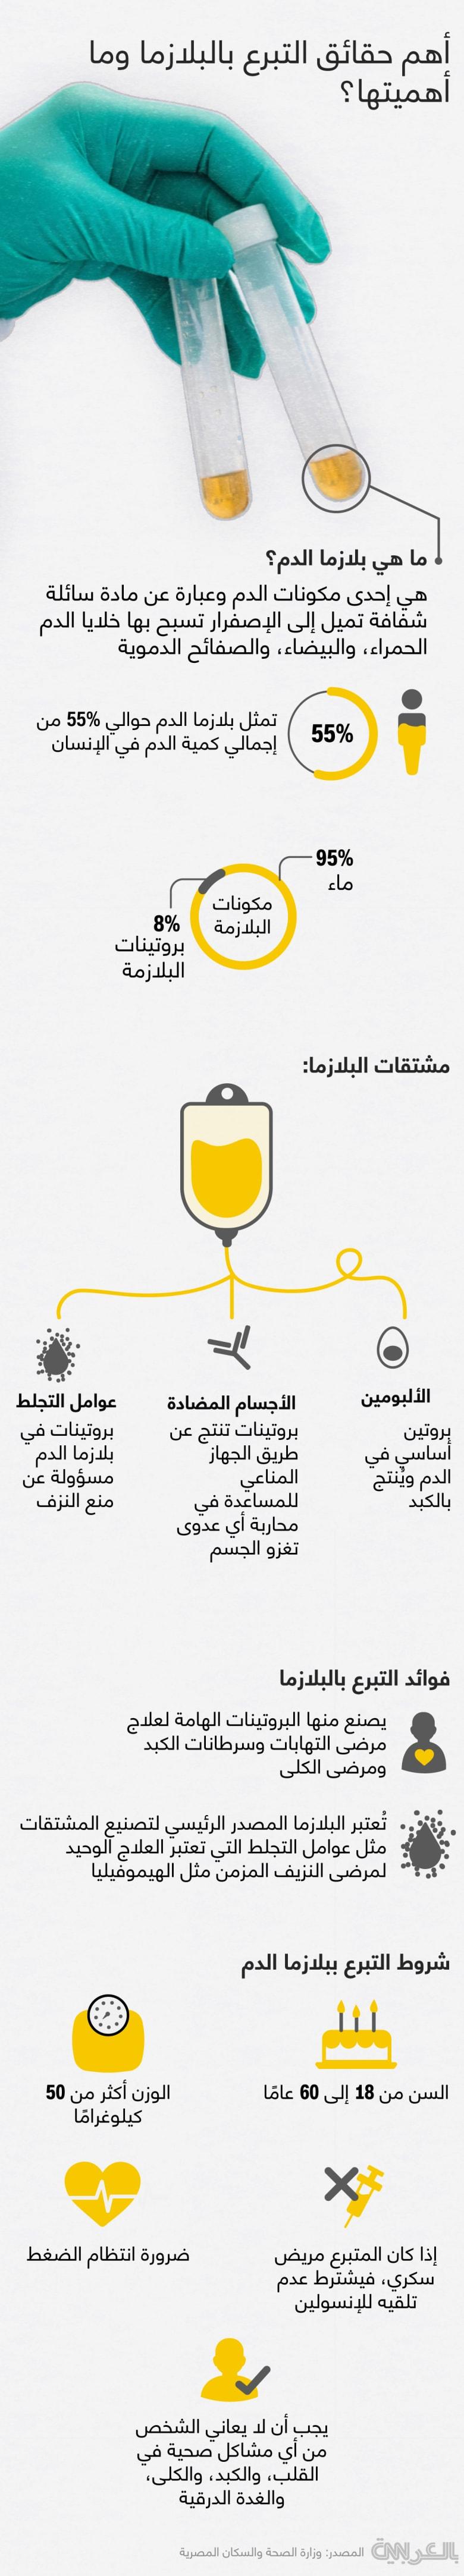 Facts-donating-blood-plasma